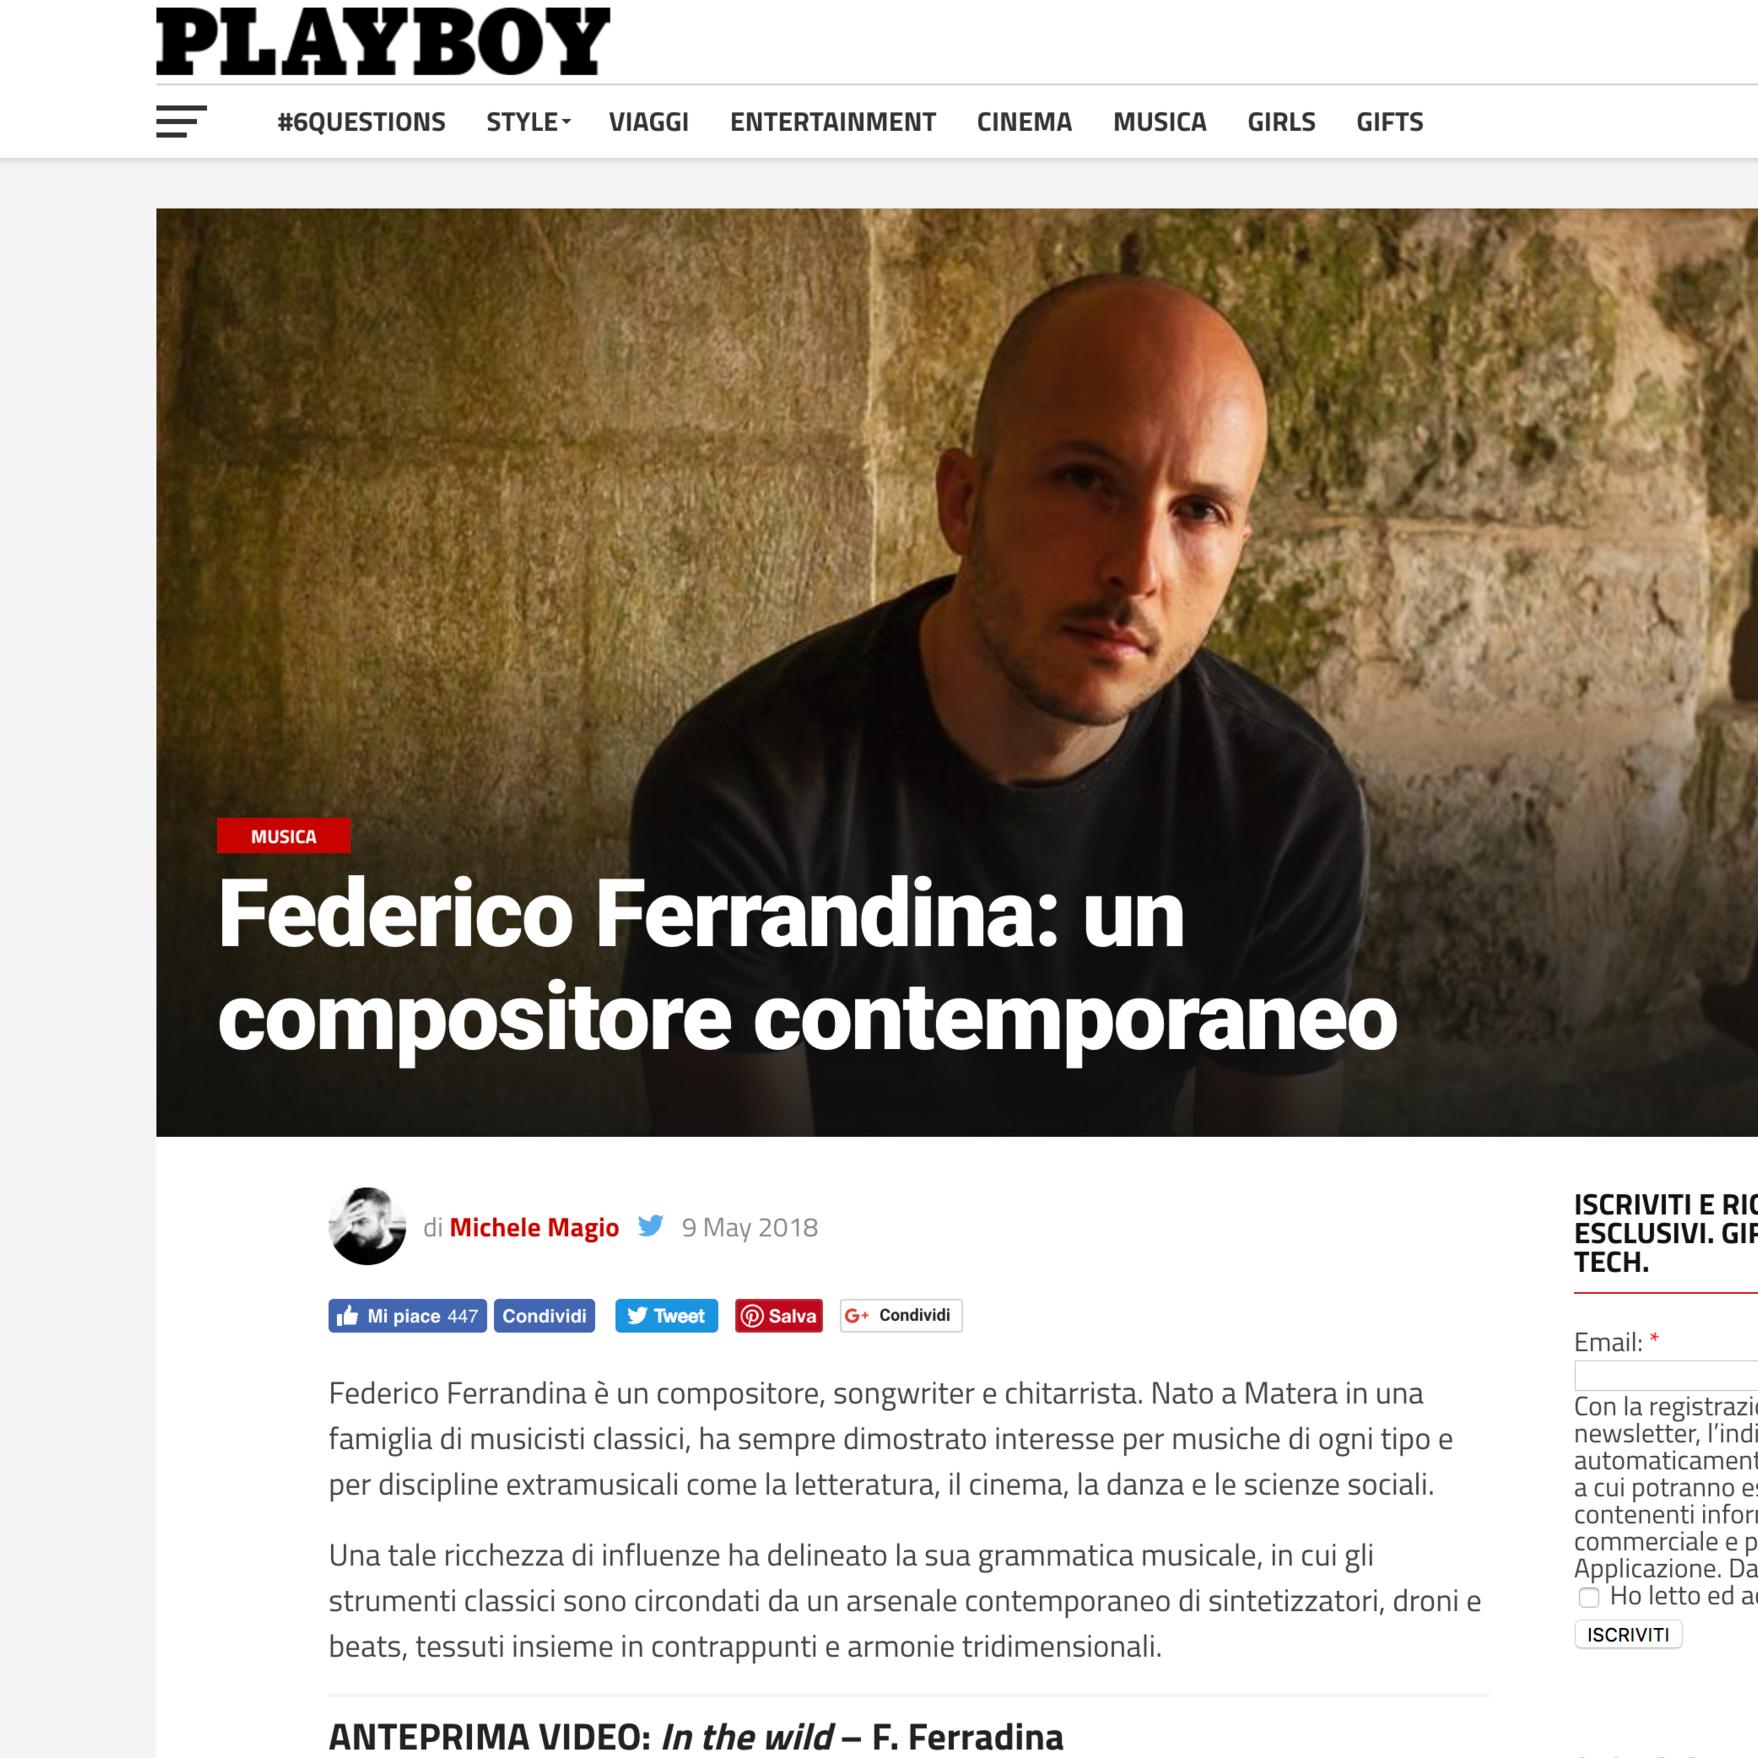 Federico Ferrandina on PlayBoy: